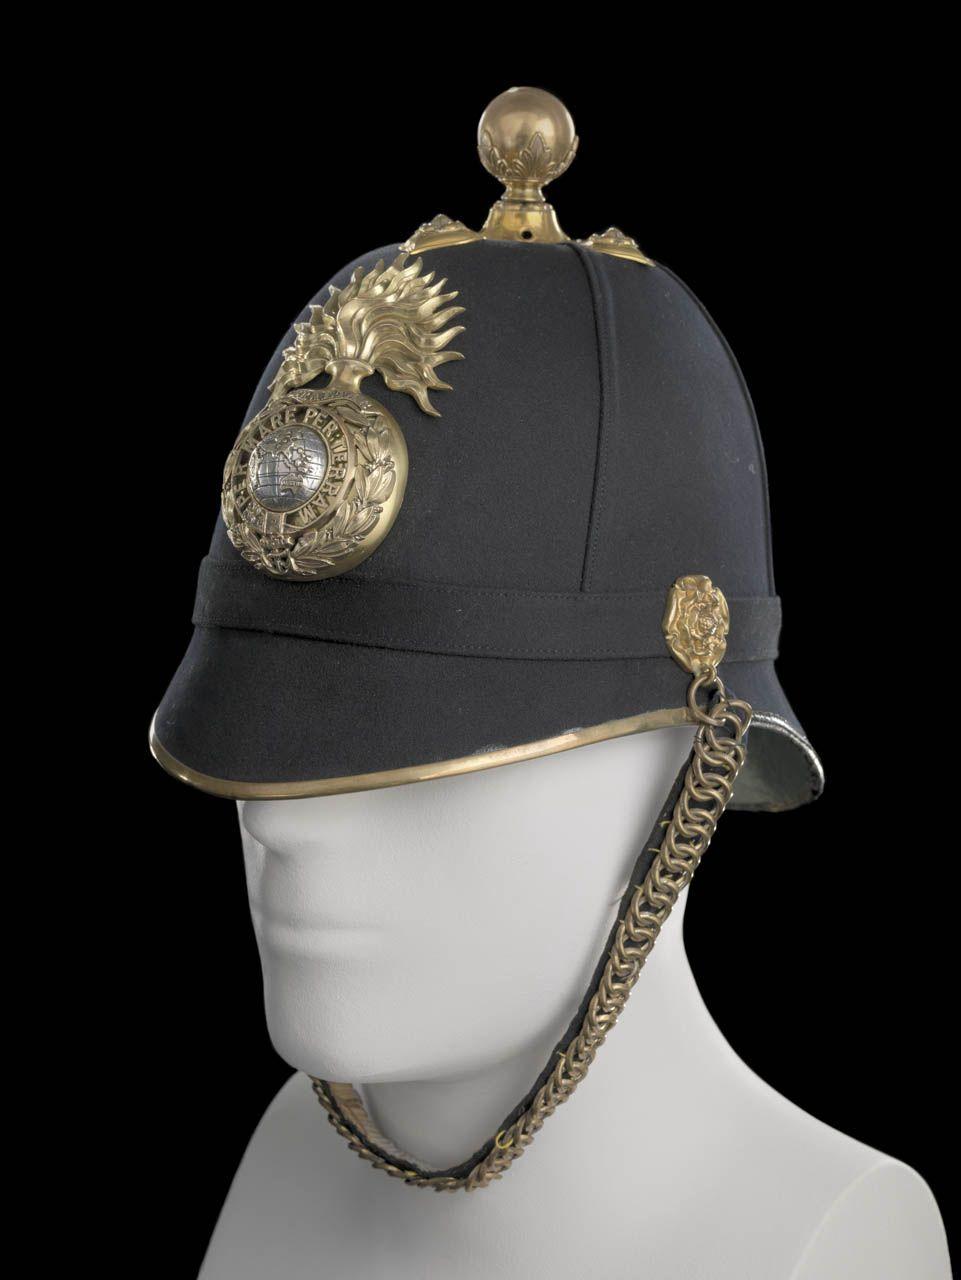 bfef73f1ba93c Pith Helmet · Royal Marine Artillery uniform  pattern 1878. British Royal  Marines